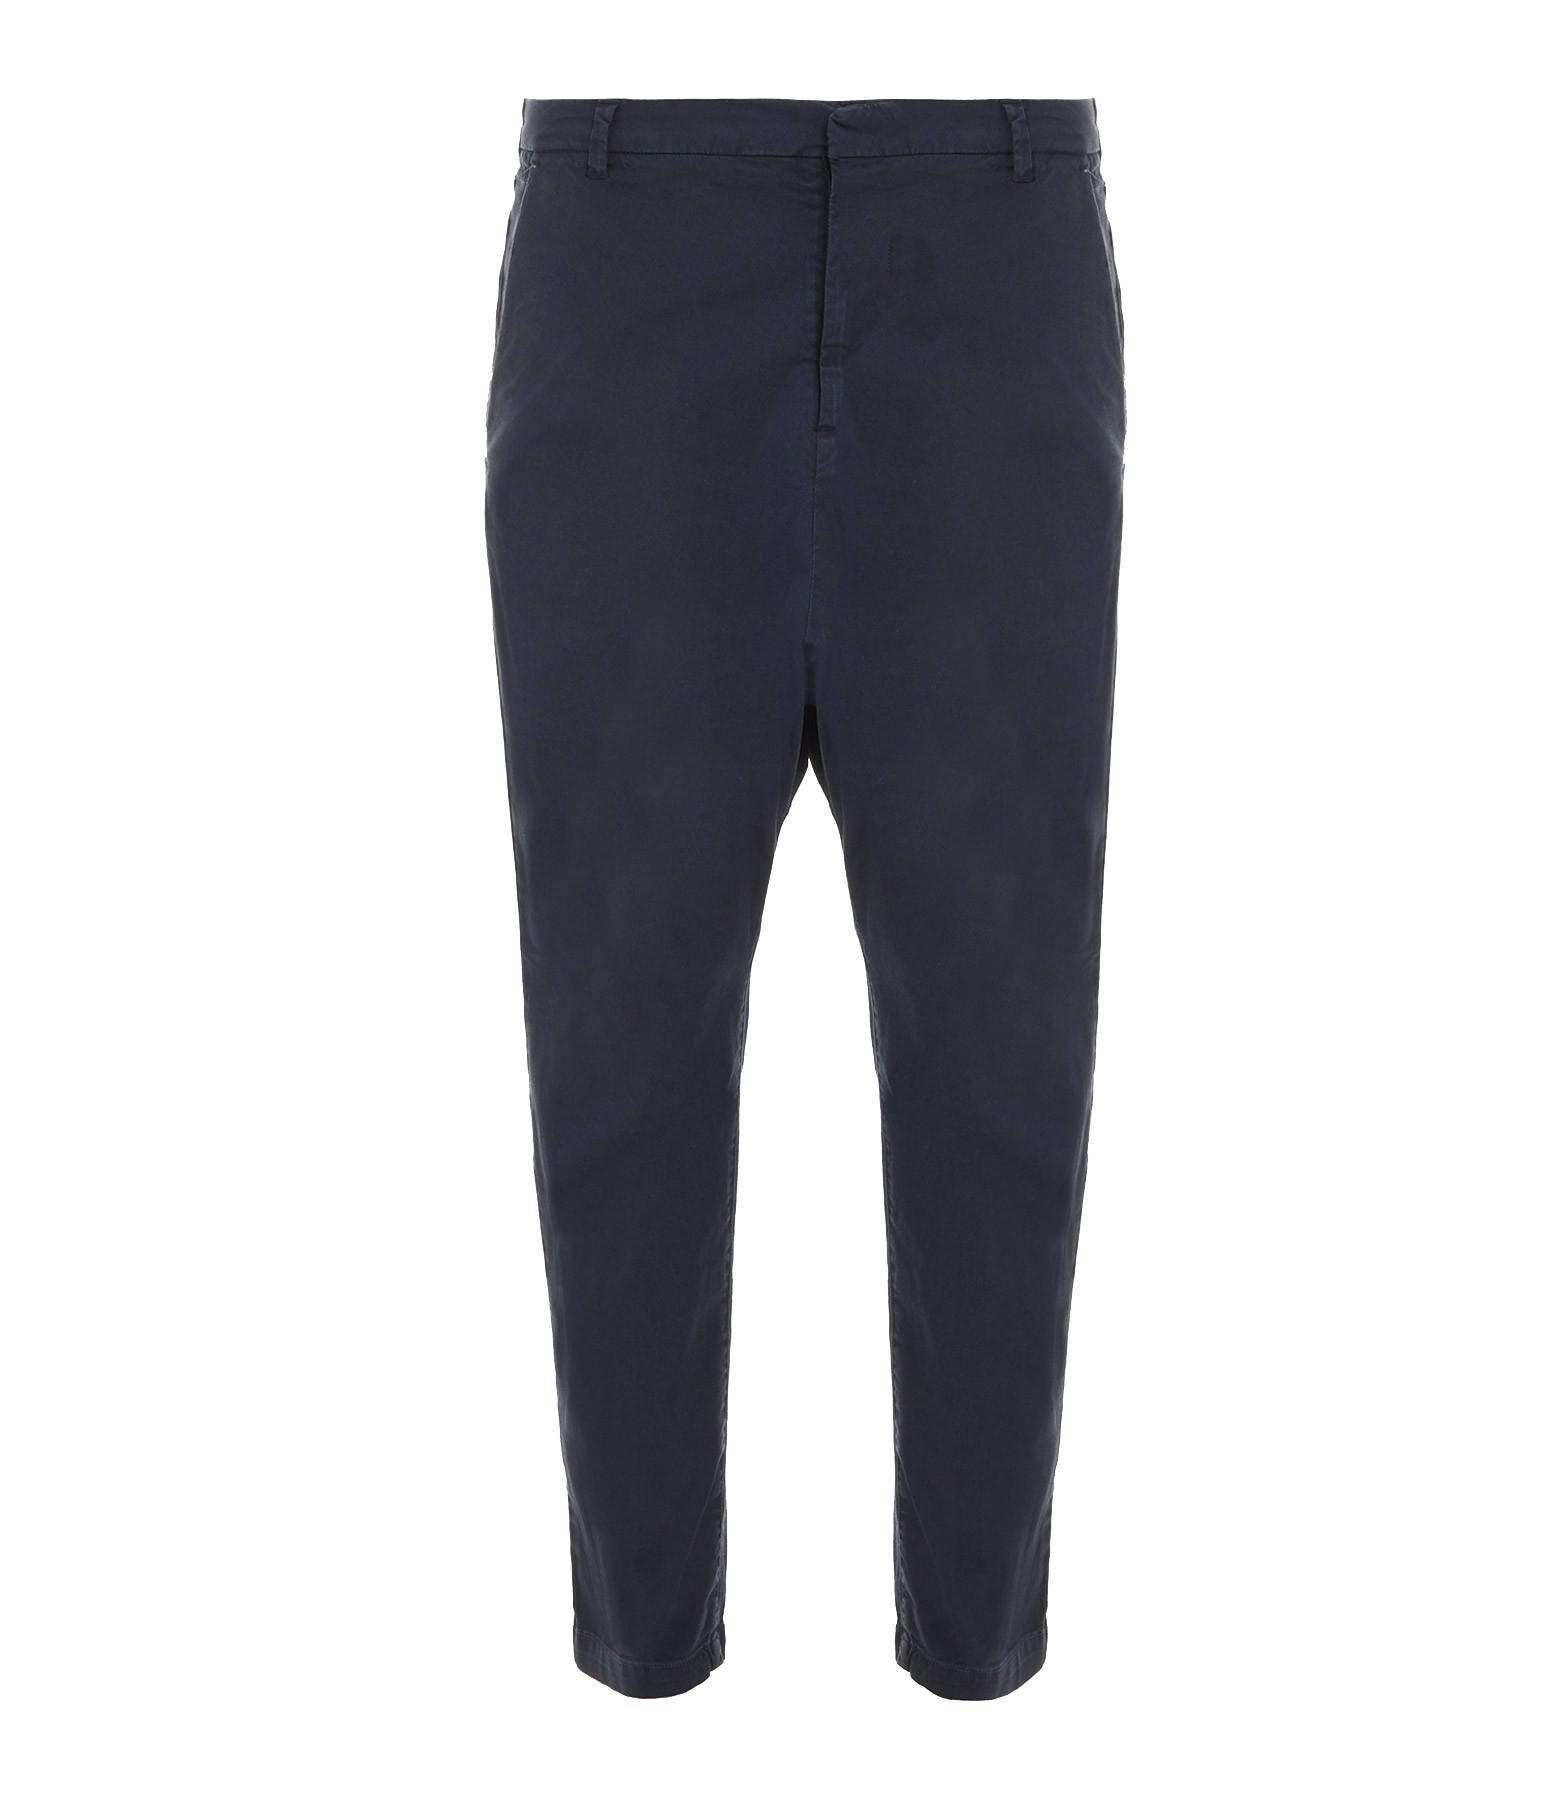 NILI LOTAN - Pantalon Paris Bleu Marine Délavé